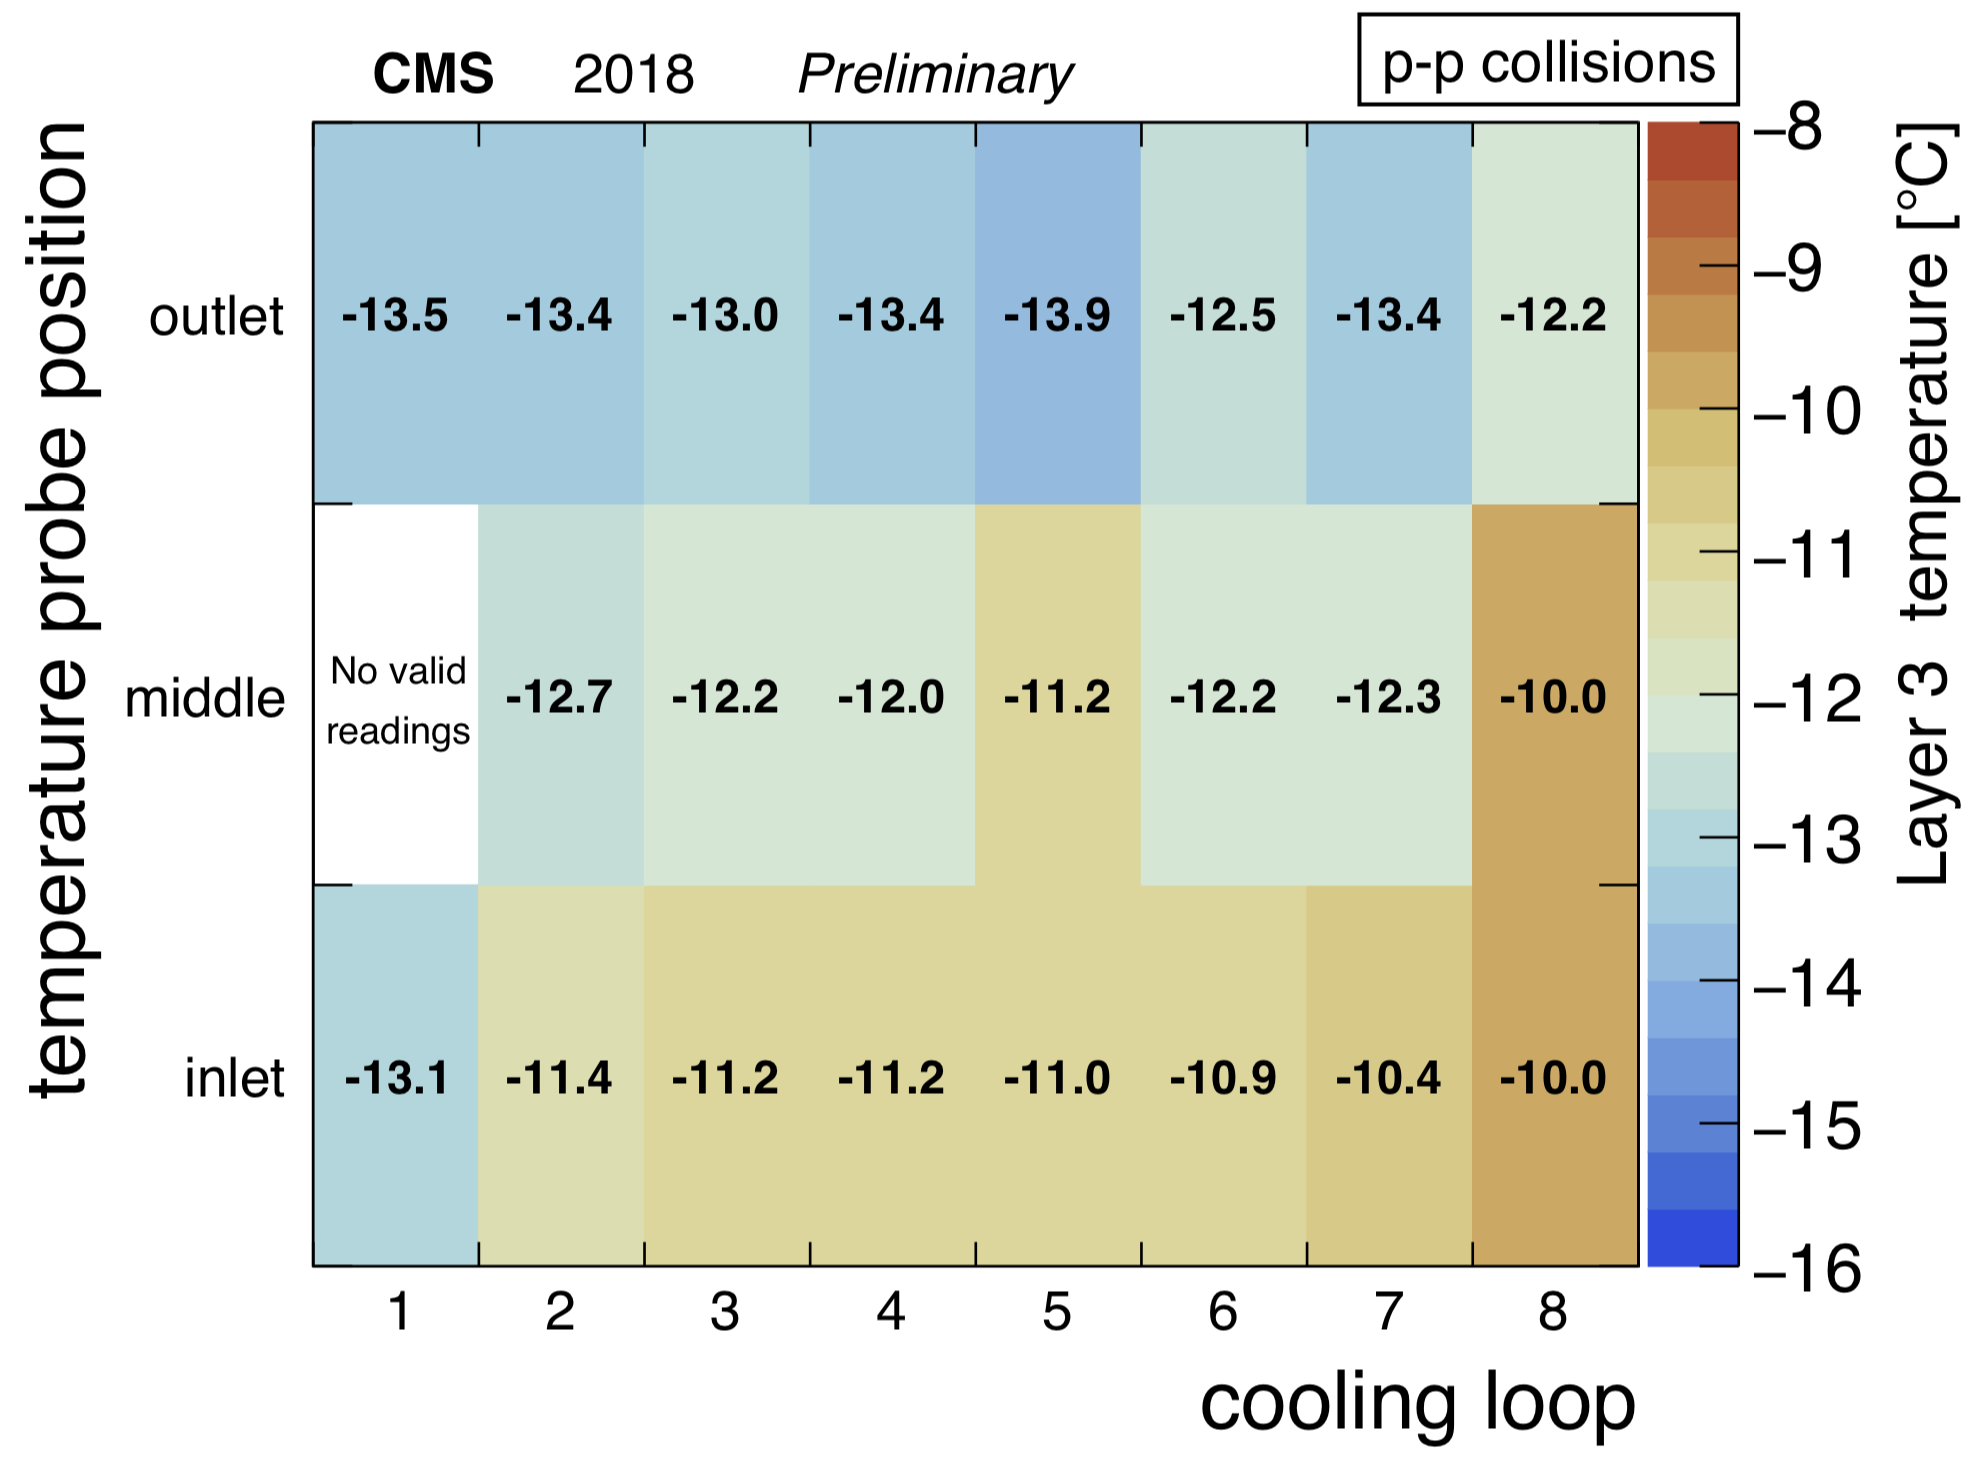 BPix_L3_temperature_2D_collision.png